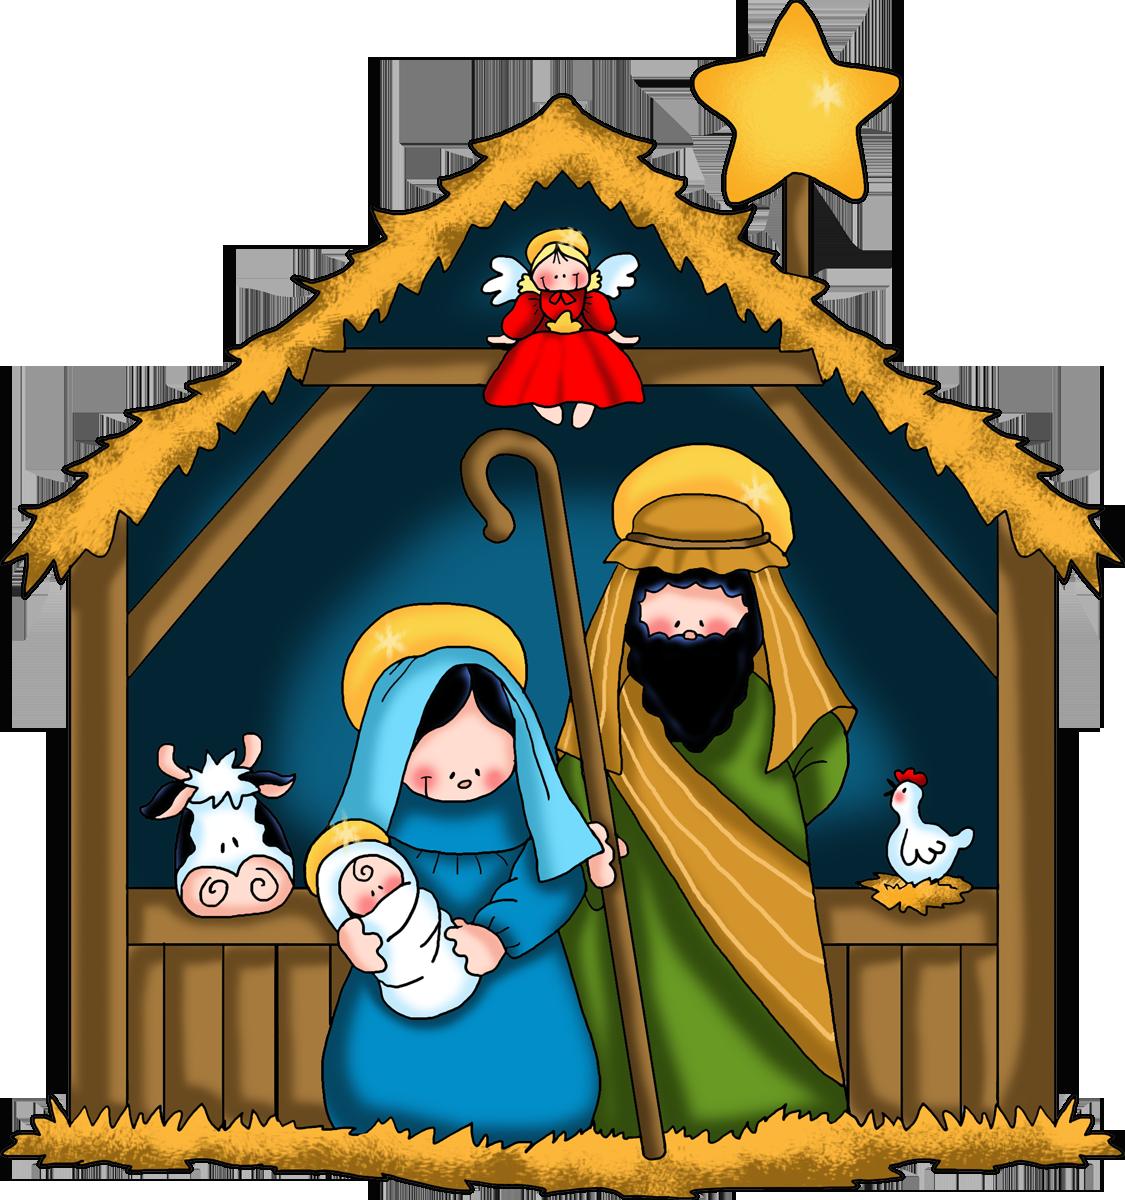 Nativity scene pictures clipart clip art freeuse the nativity children free clip art - Google Search | Kids ... clip art freeuse